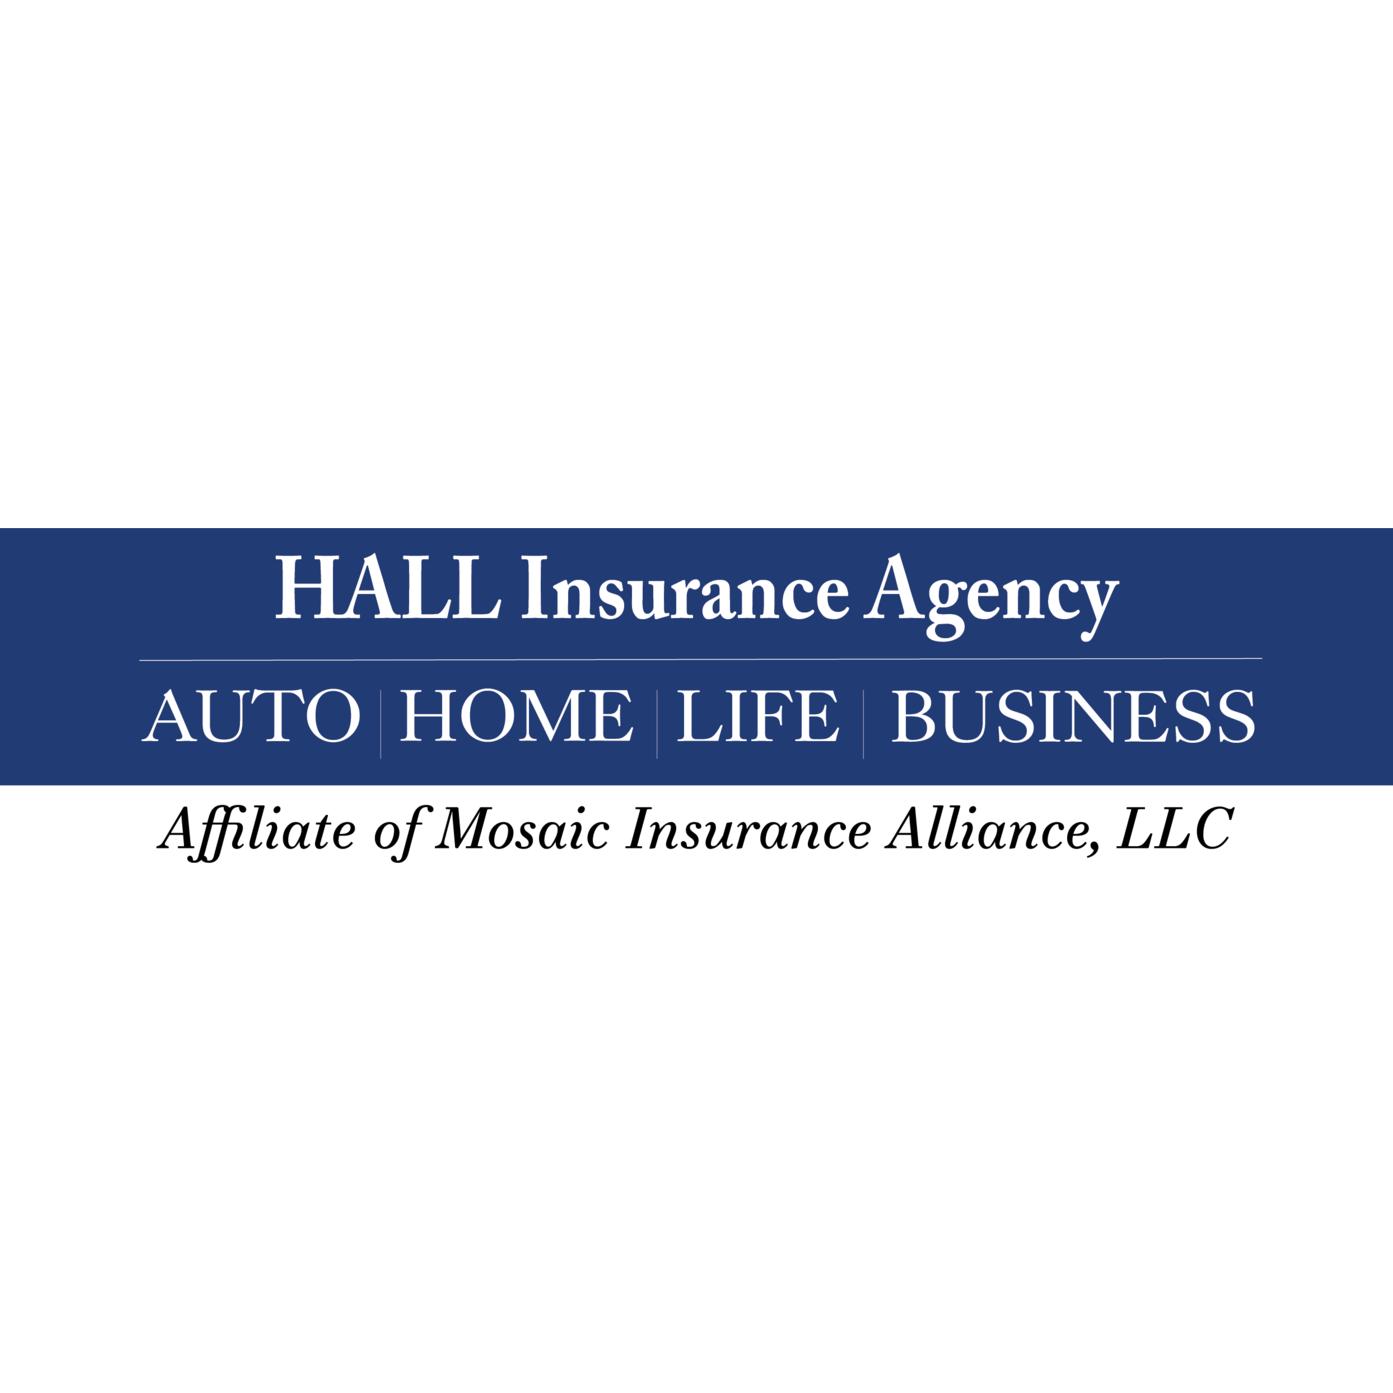 Insurance Broker in WA Mukilteo 98275 Rae Ann Hall - HALL Insurance Agency 8490 Mukilteo Speedway #210  (425)212-1802